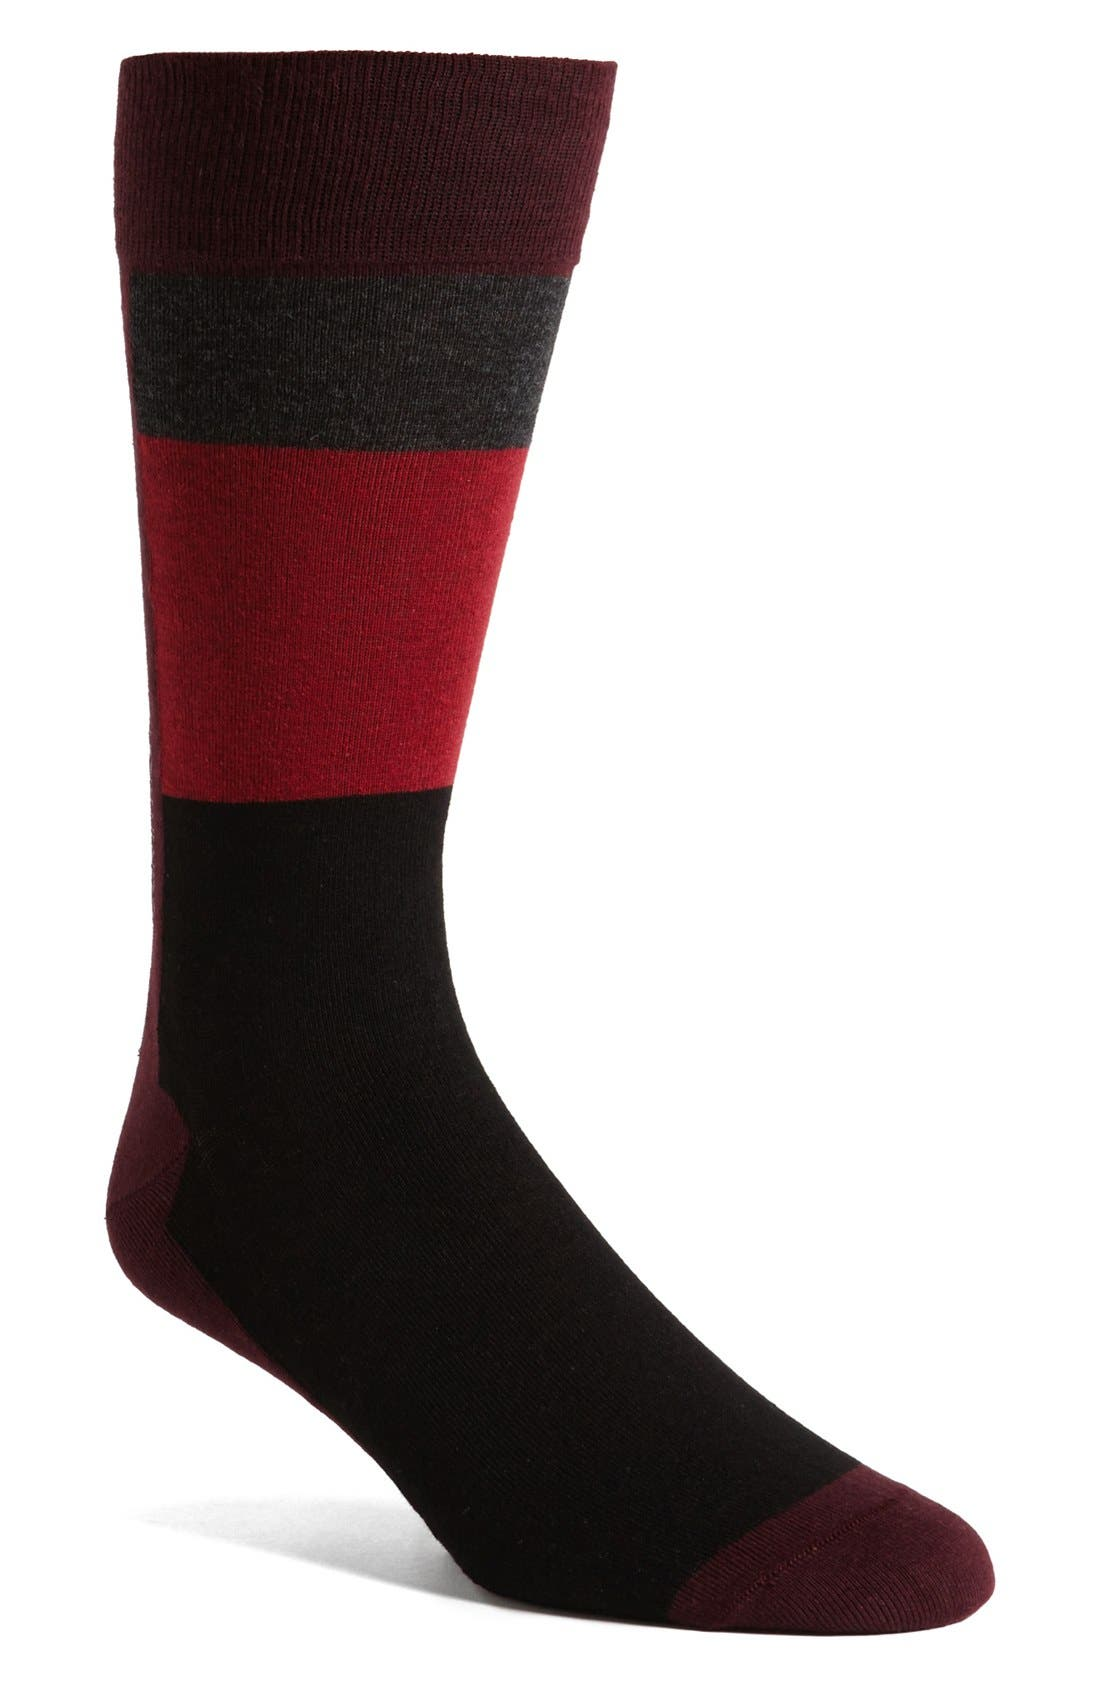 Alternate Image 1 Selected - Calvin Klein Colorblock Socks